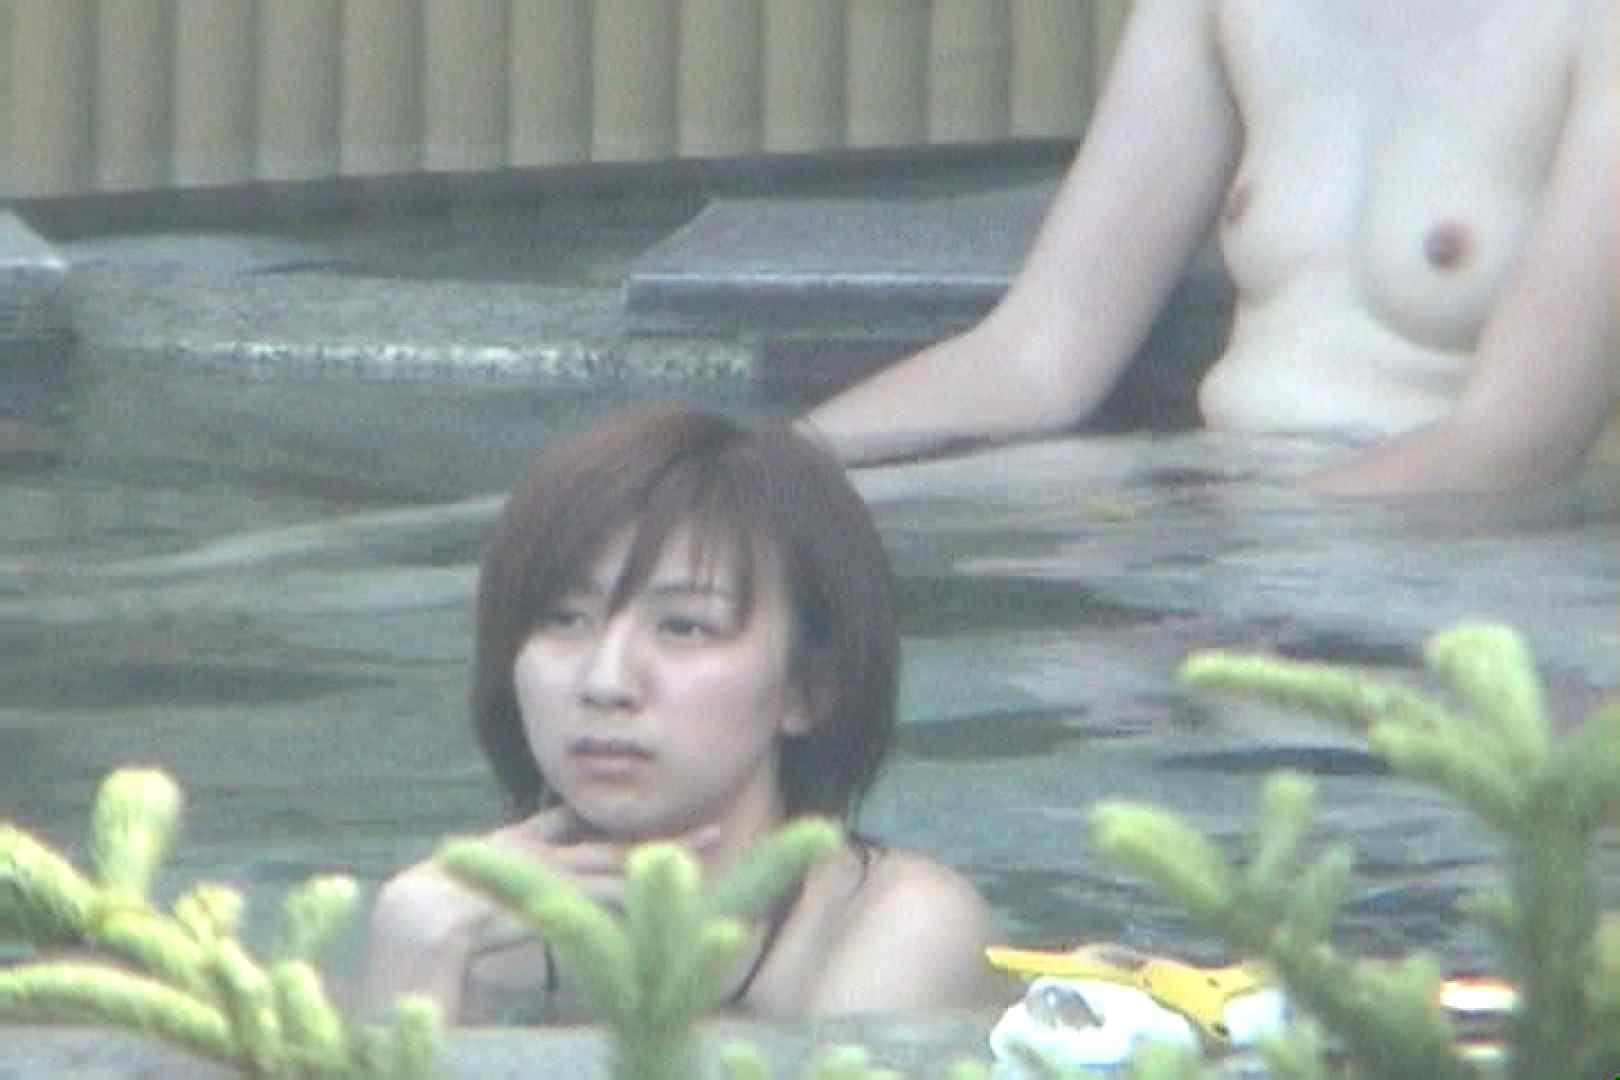 Aquaな露天風呂Vol.77【VIP限定】 露天風呂編 | 盗撮シリーズ  100PIX 7